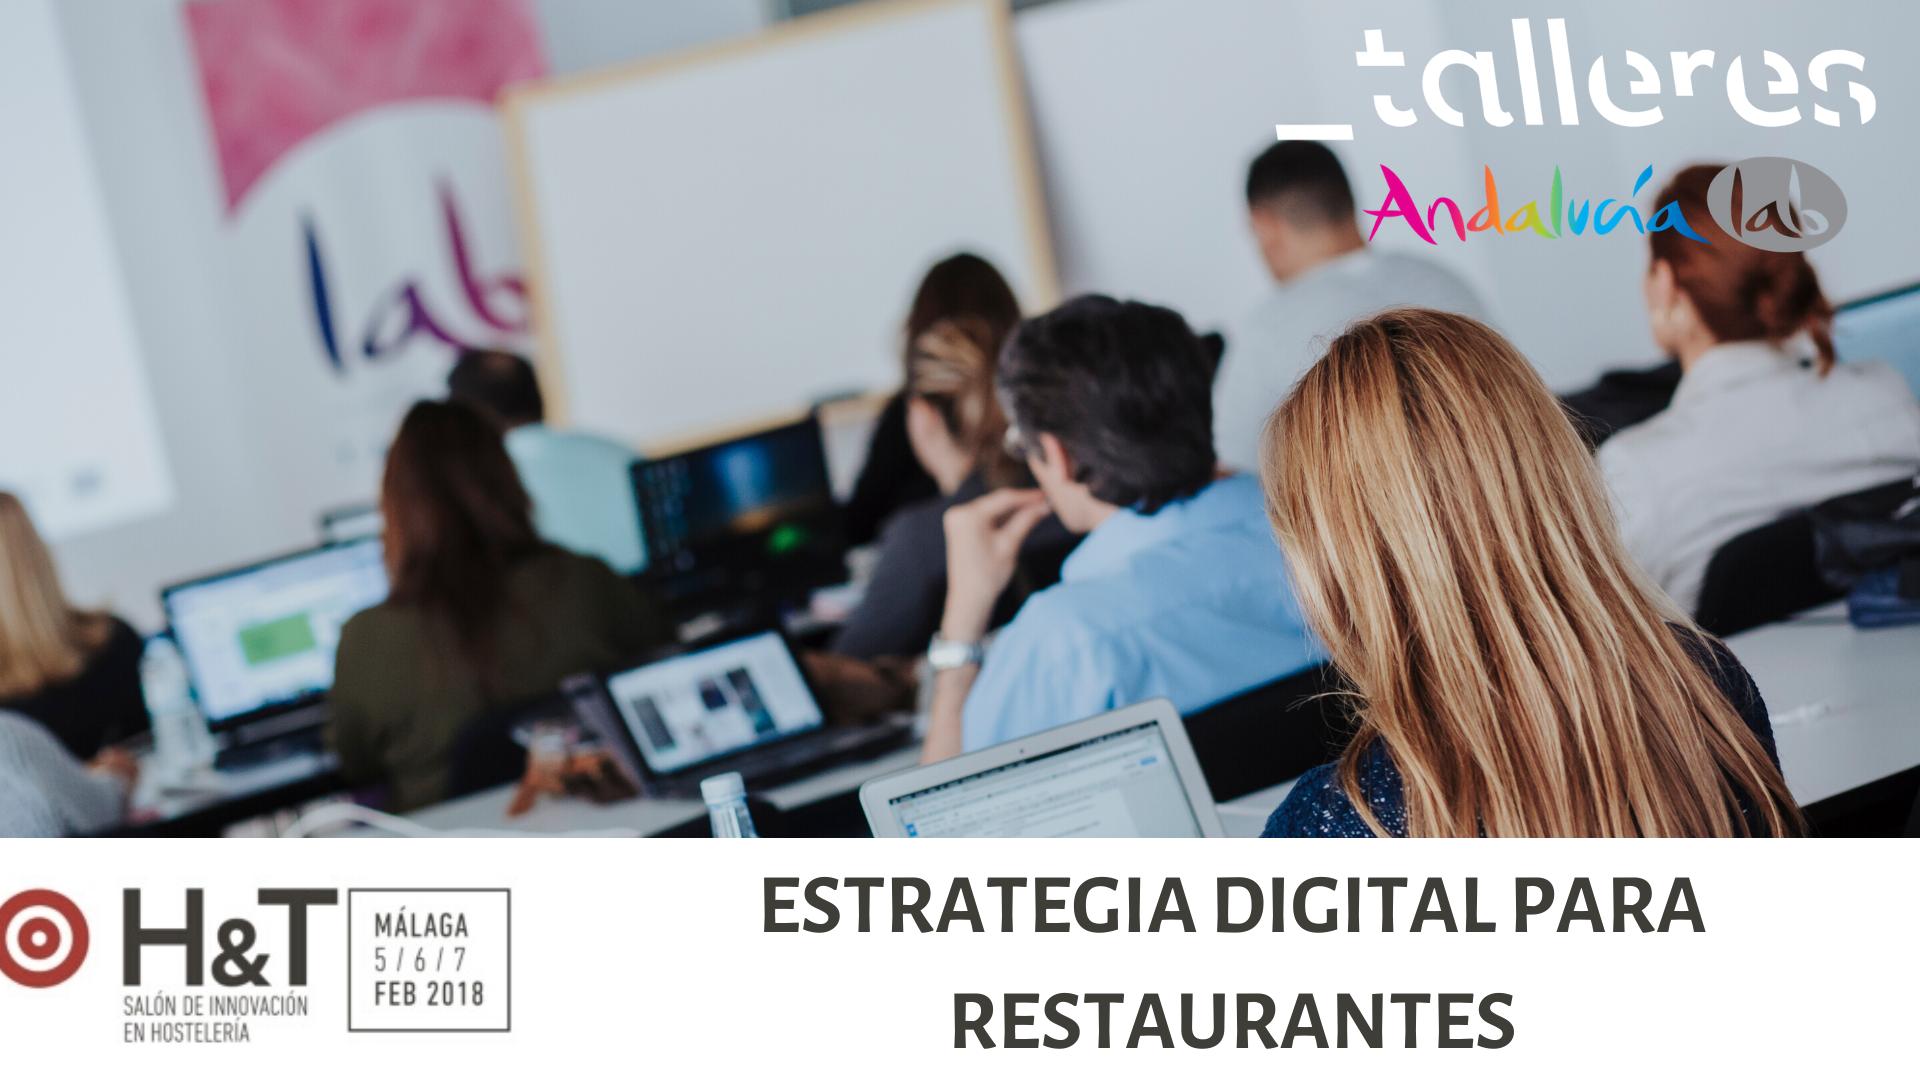 Taller en H&T: Estrategia digital para restaurantes